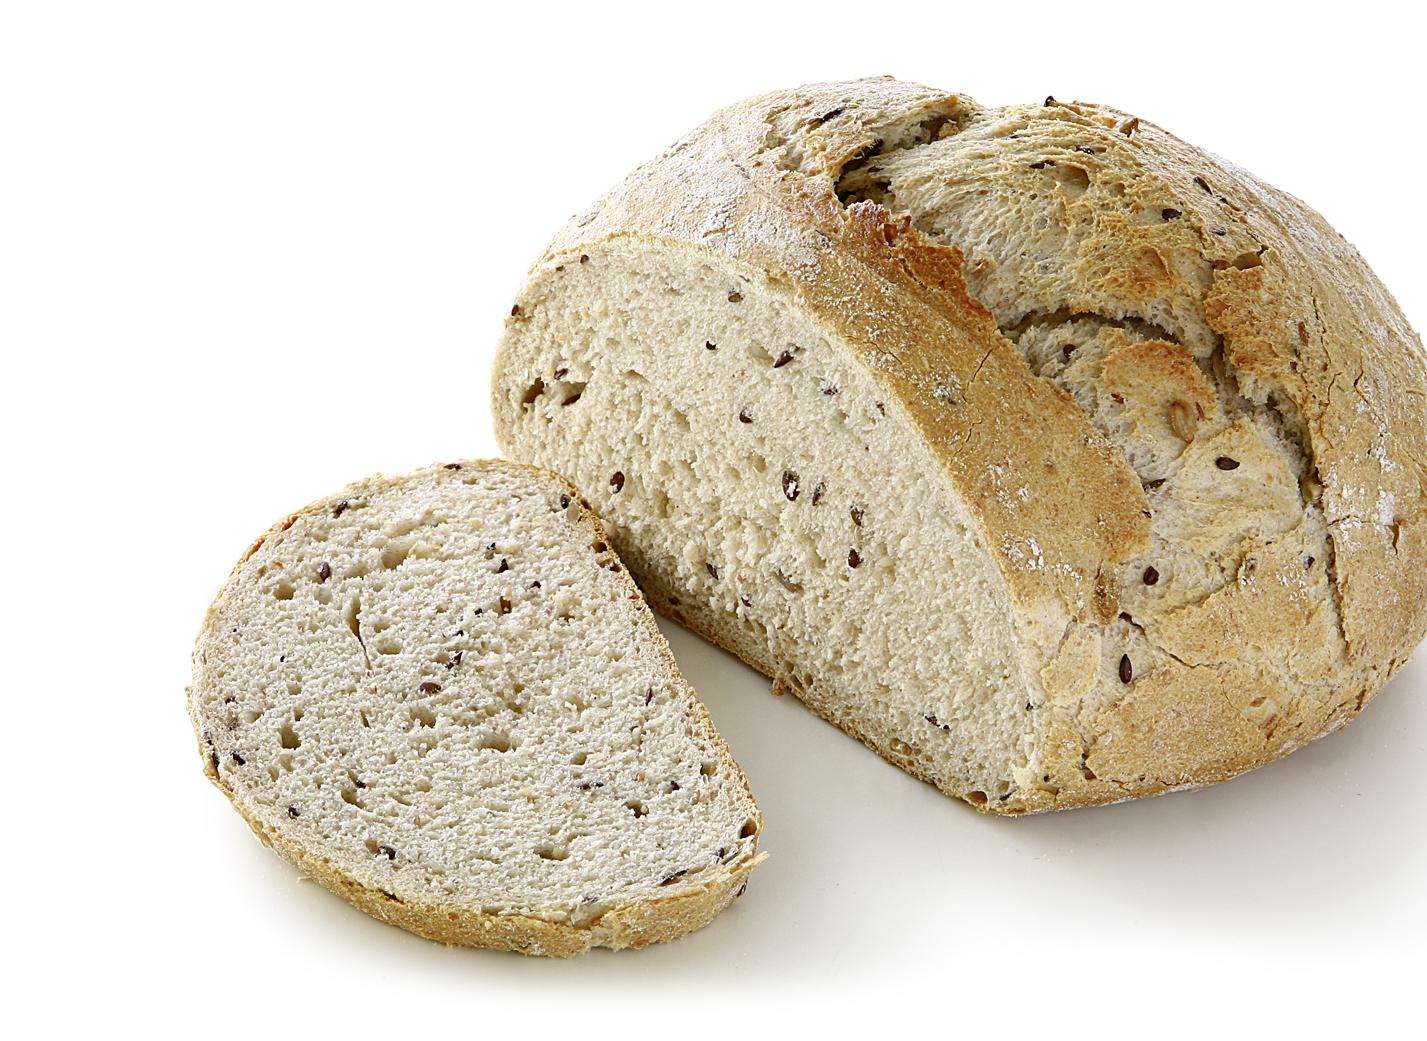 Organic Spelt Bread DE-ÖKO-034 - ORGANIC Spelt Bread with spelt wholegrain sourdough, 2% ORGANIC sunflower kernels, 2% ORGANIC linseeds, 2% ORGANIC potato flakes, sea salt and sesame/ diameter: approx. 18 cm